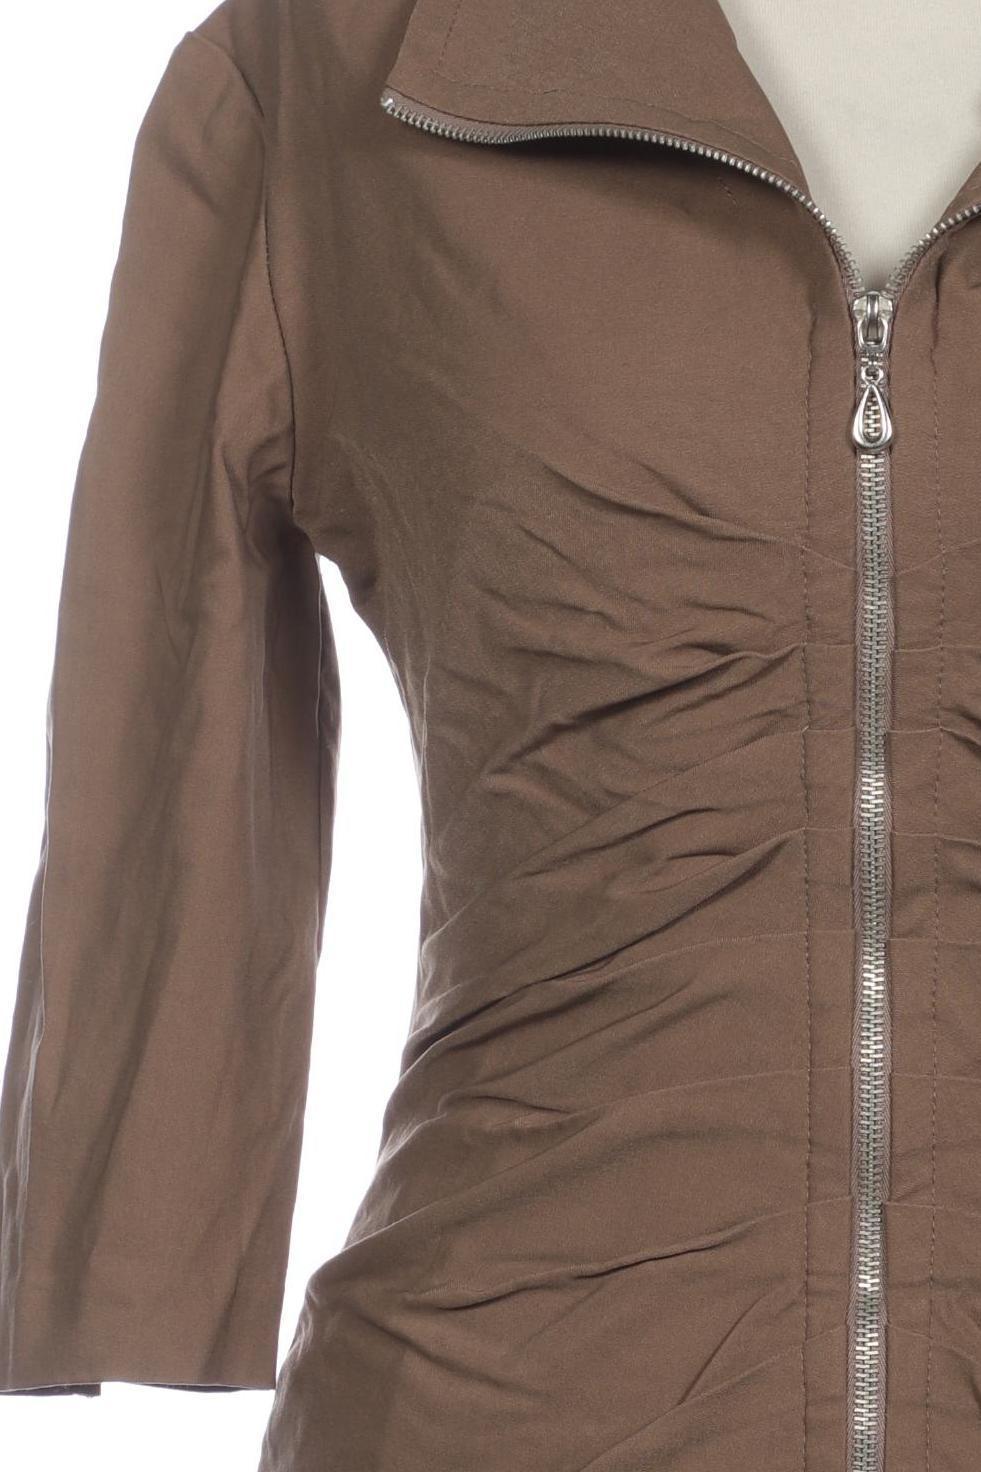 Joseph Ribkoff Damen Kleid UK 10 Second Hand kaufen | ubup